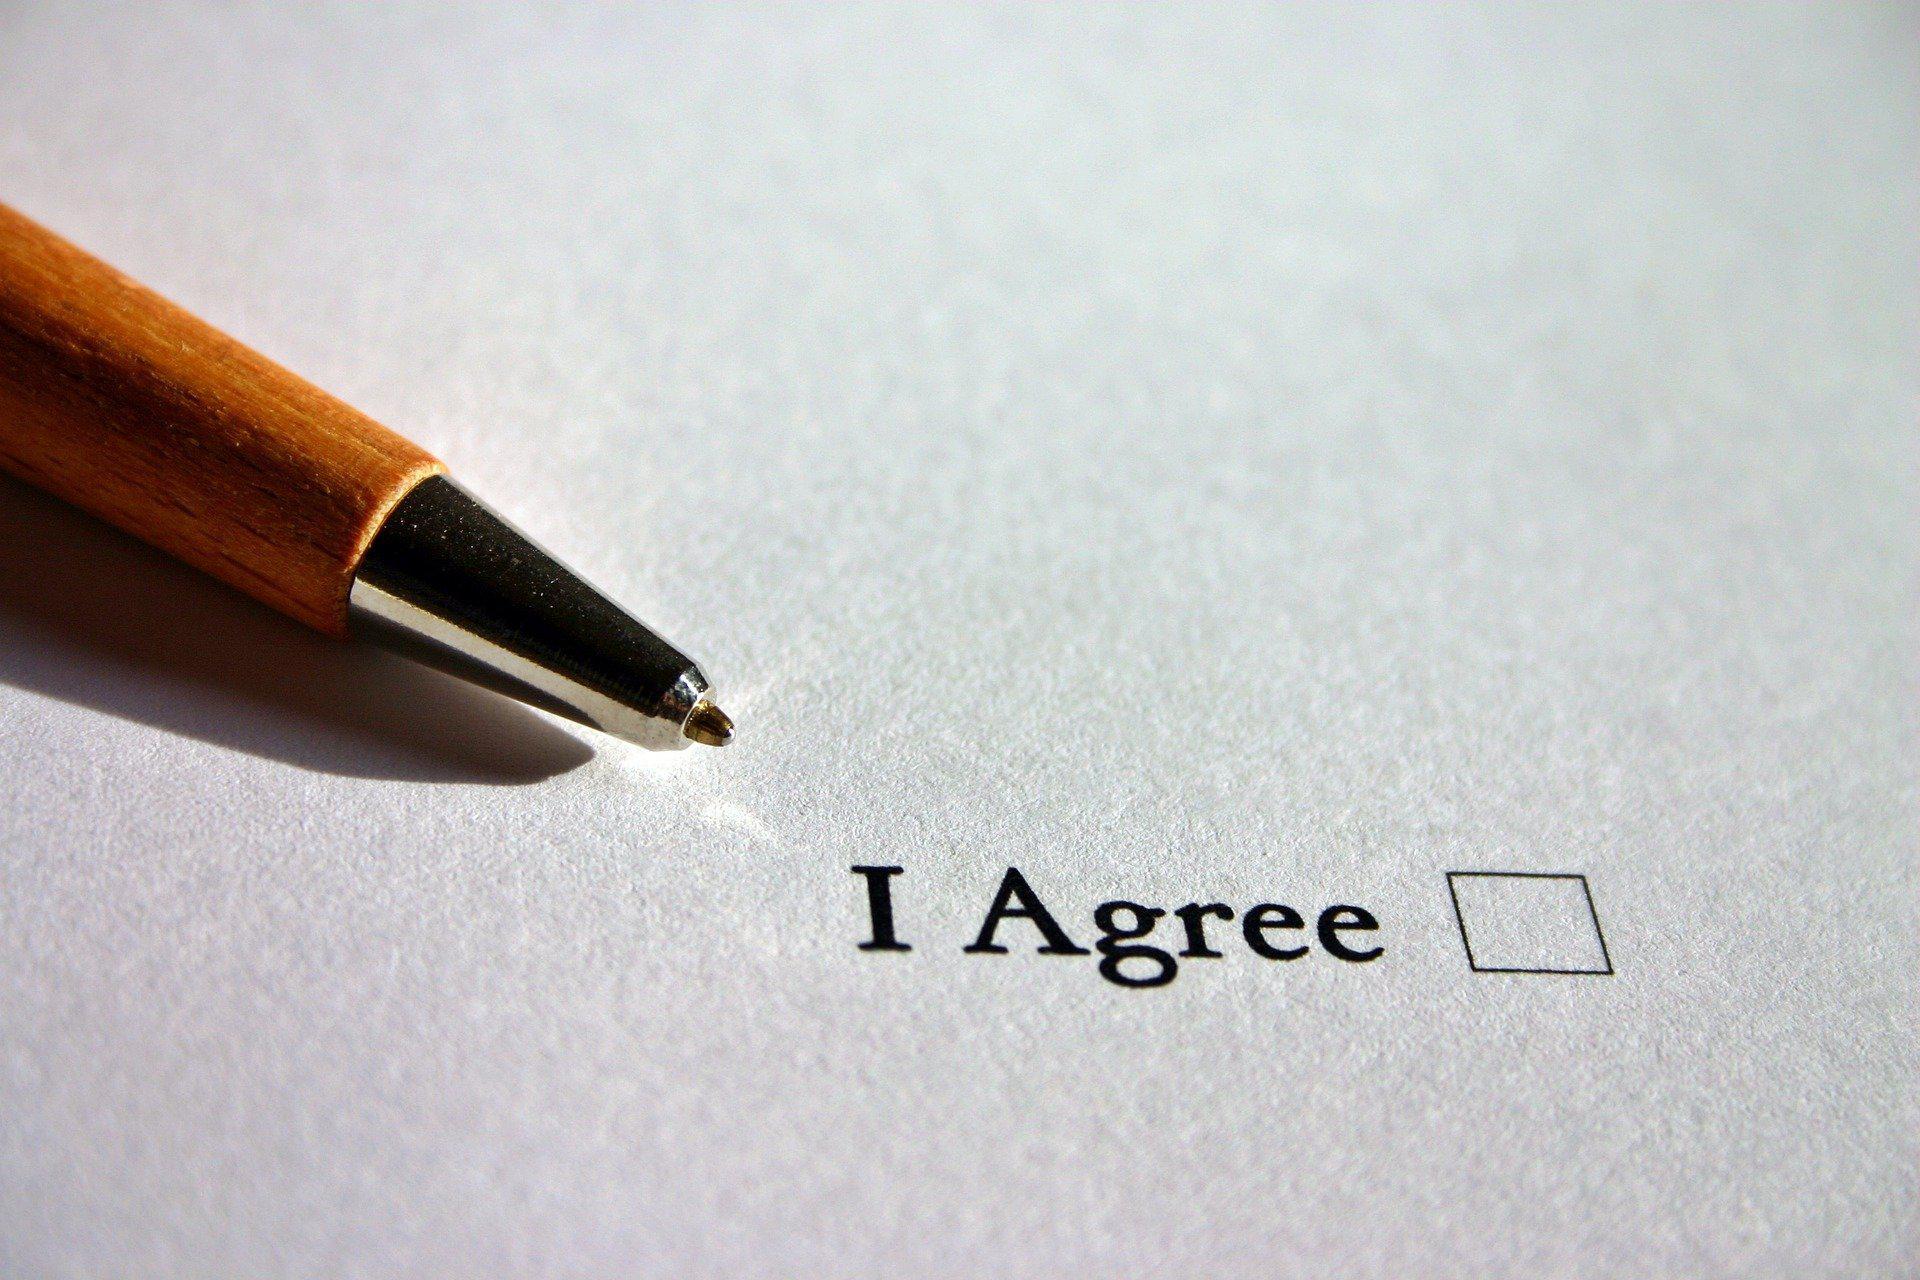 Гонконг и Канада подписали налоговое соглашение